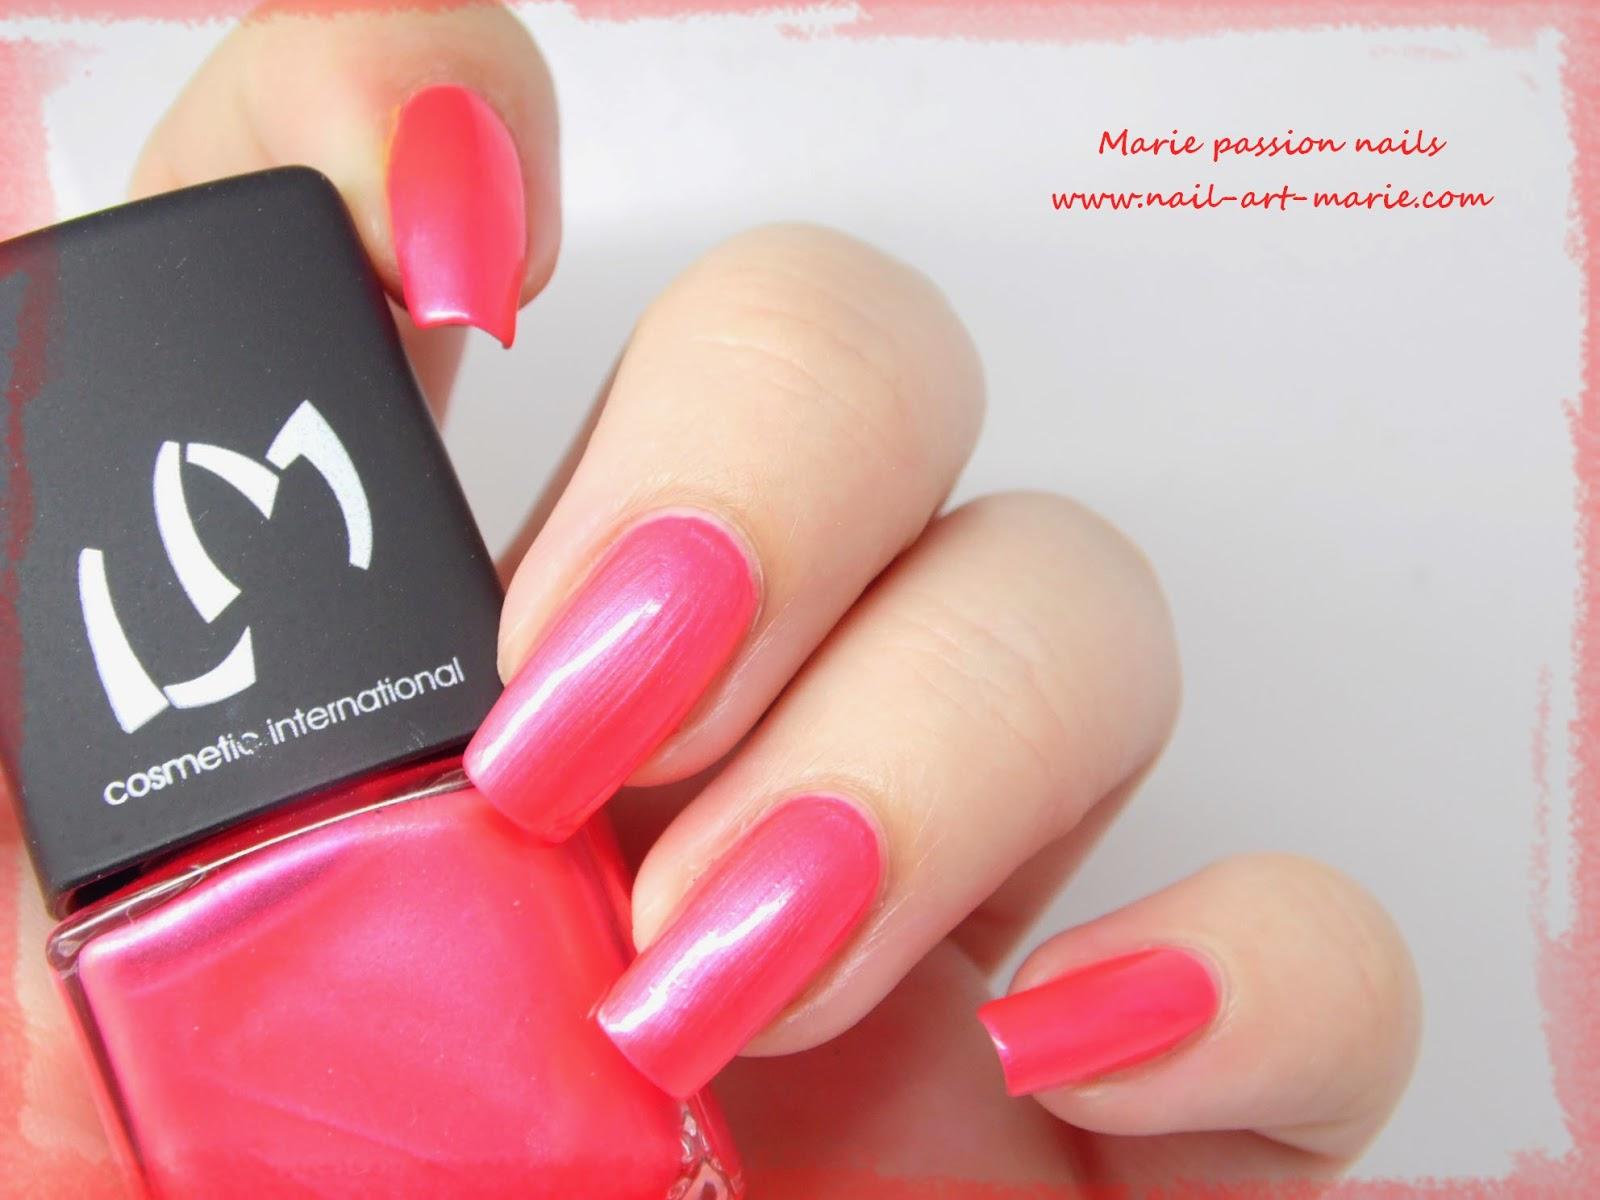 LM Cosmetic Fonte Nova7